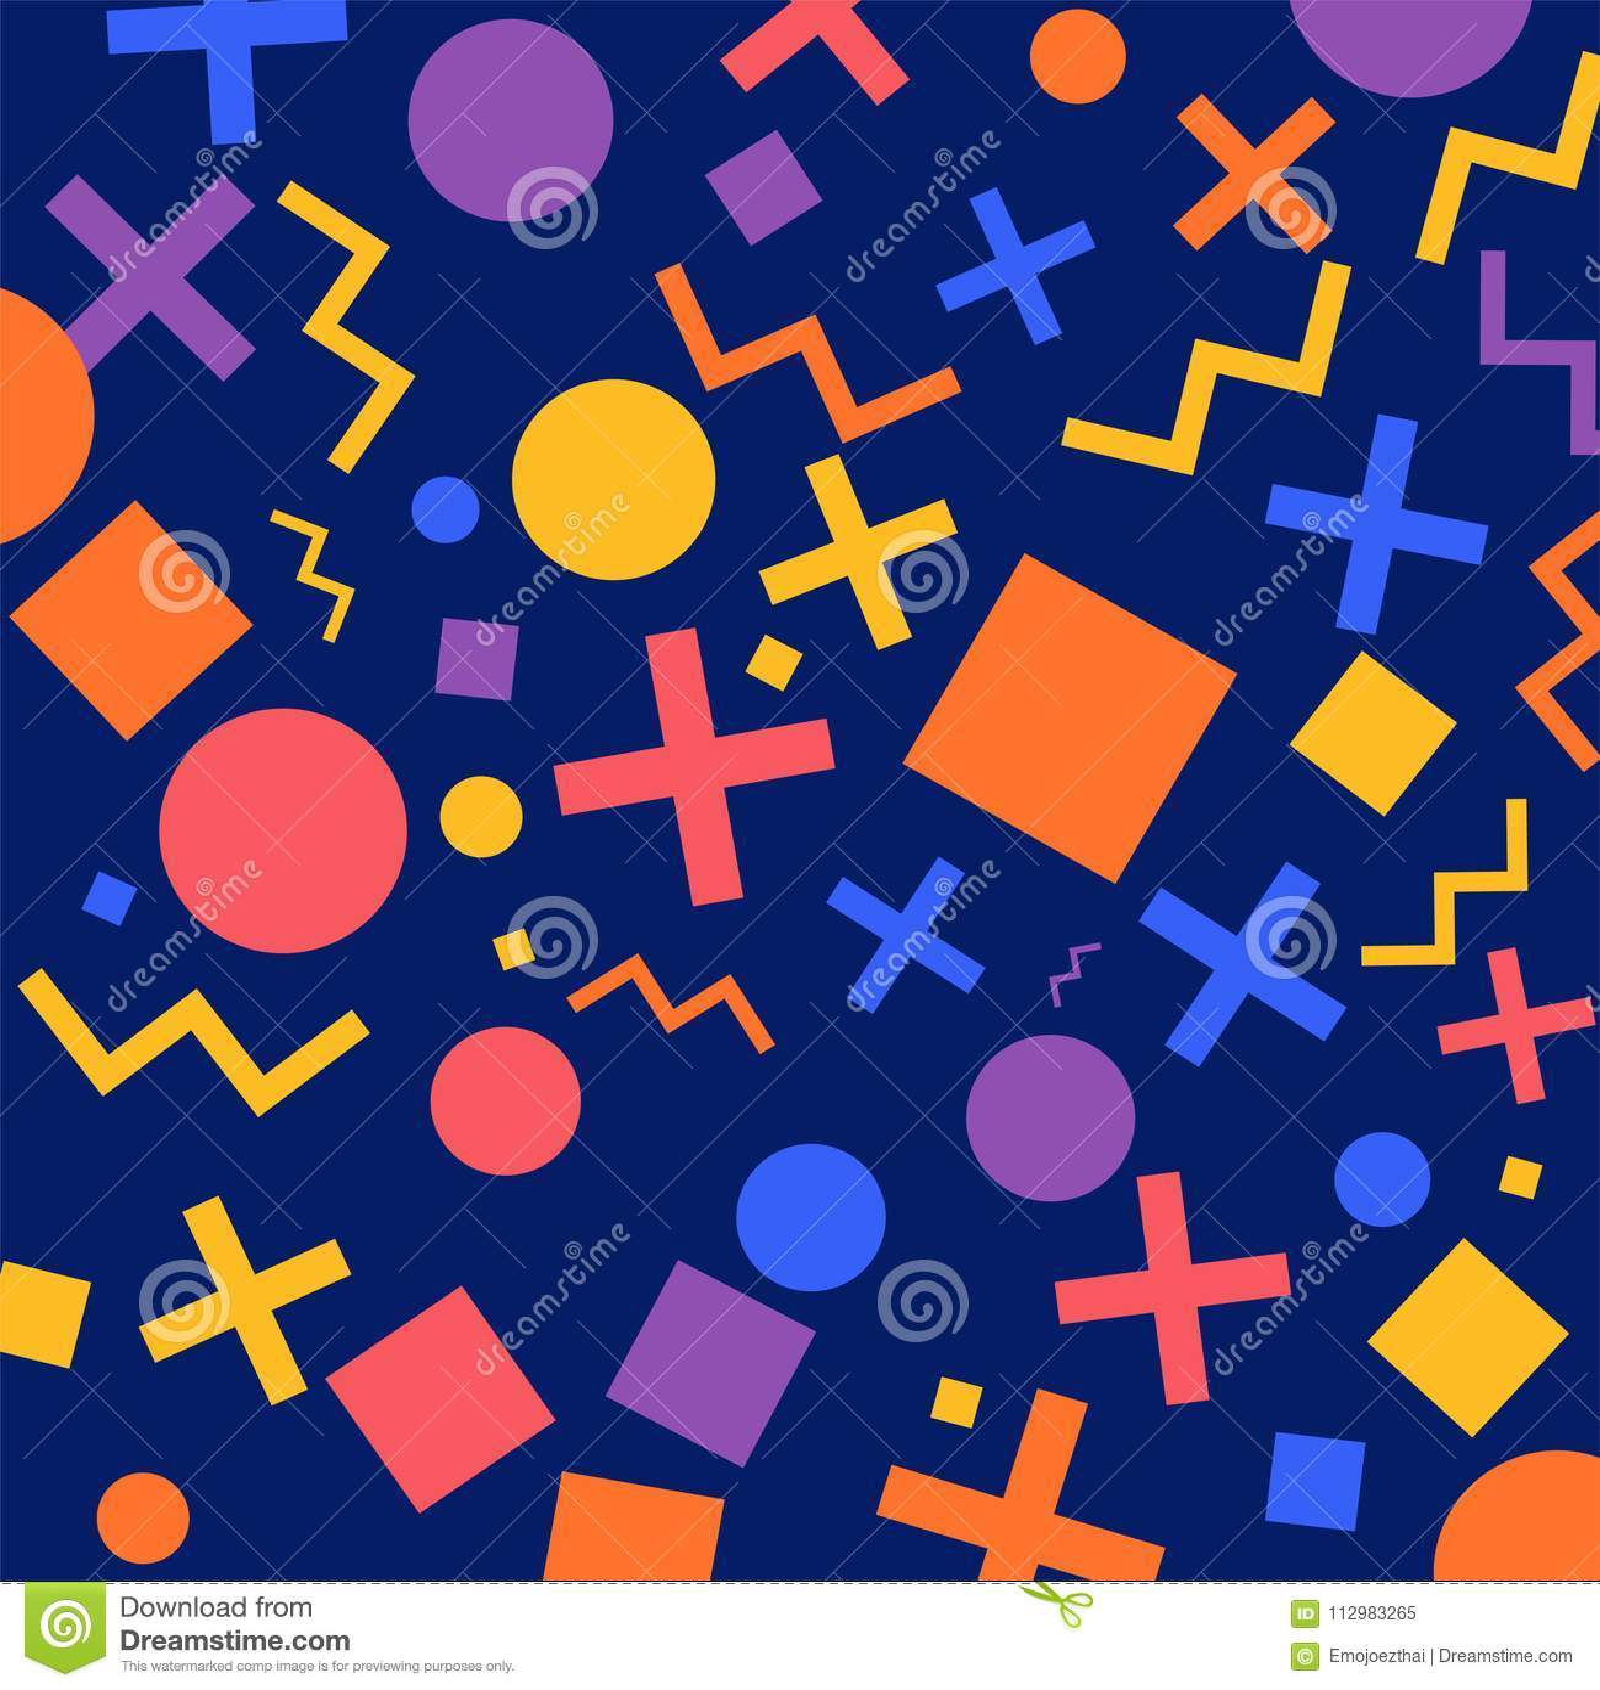 Flat_Design_Backgrounds_04